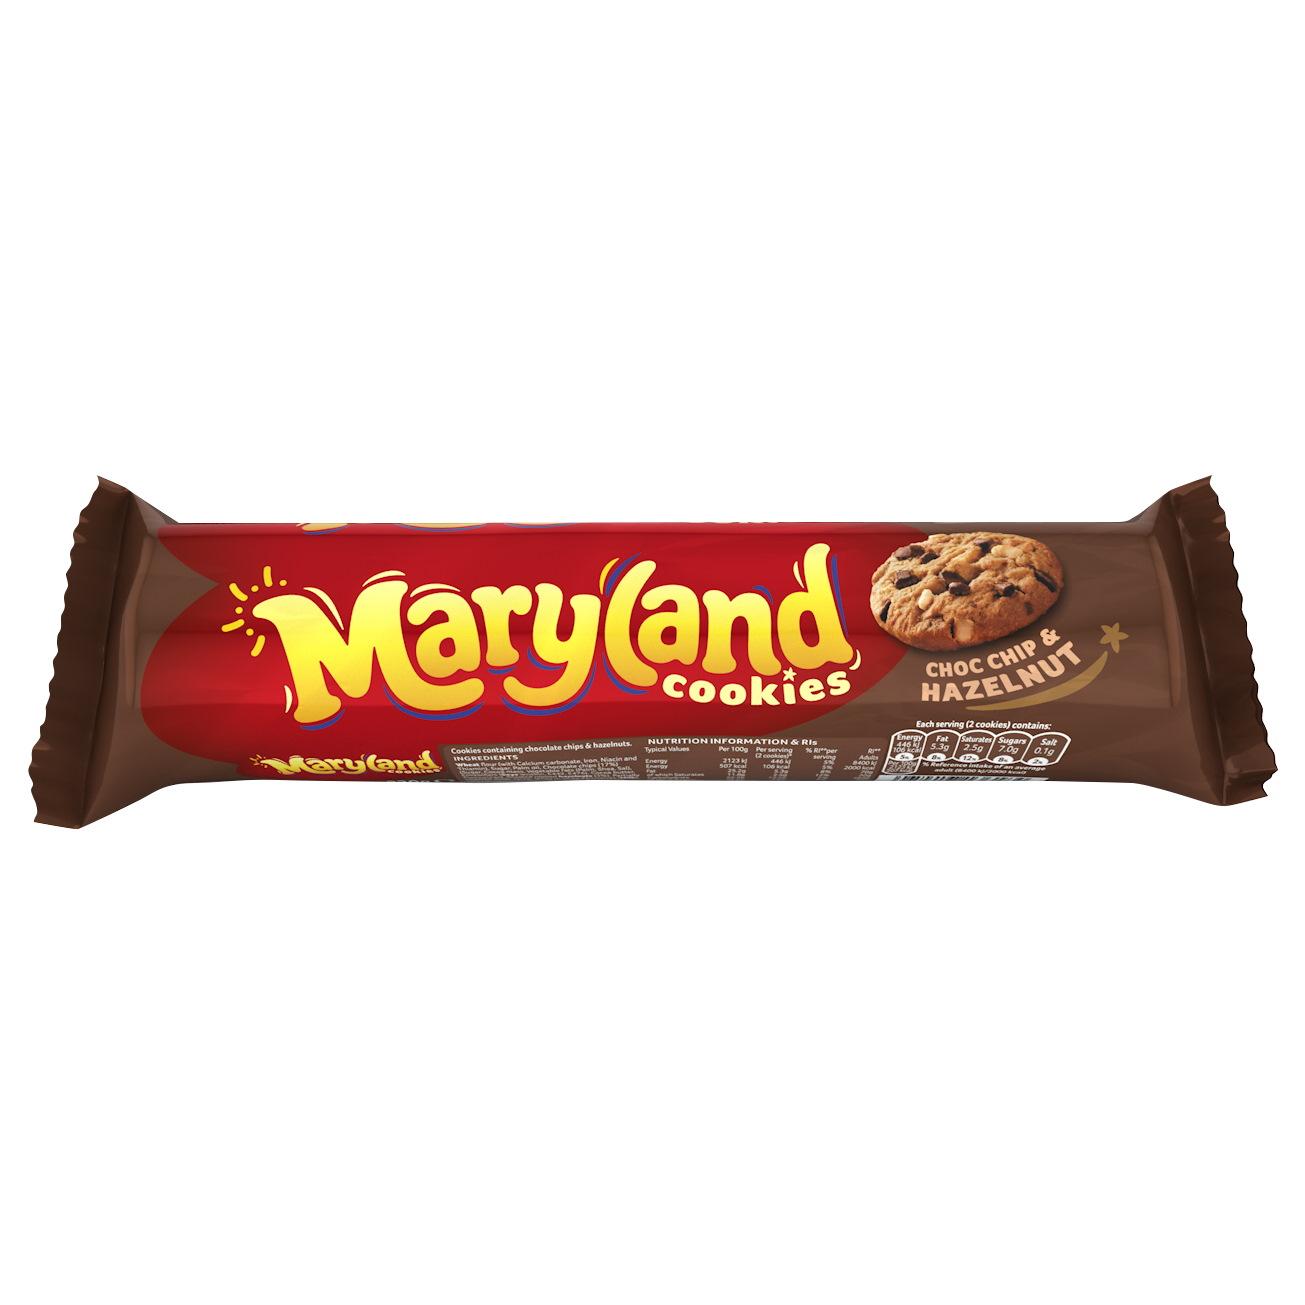 maryland choc chip & hazelnut cookies